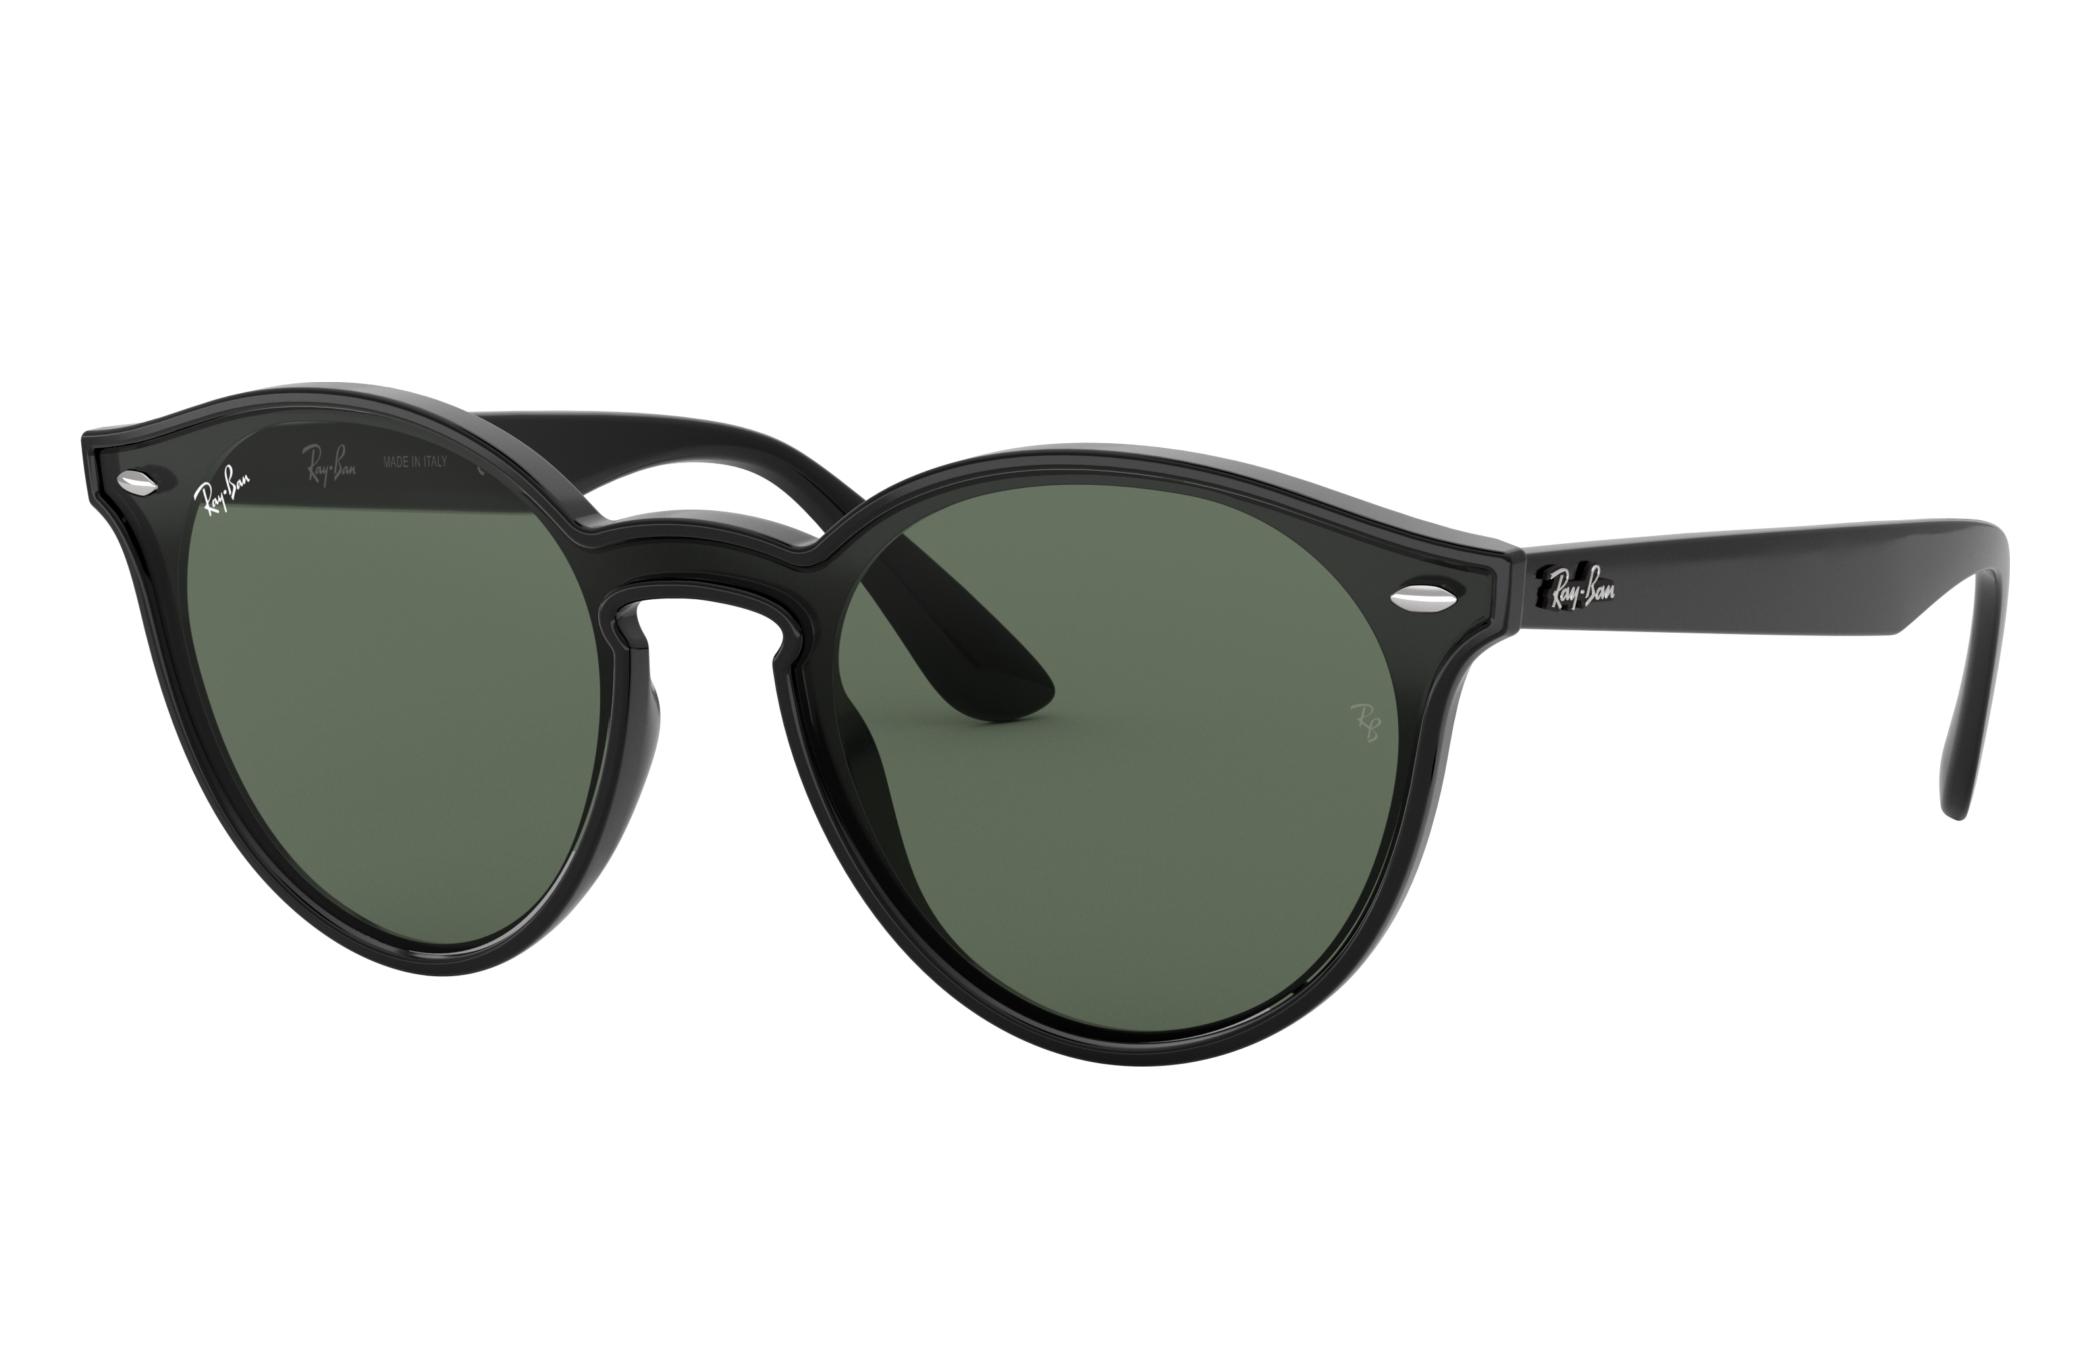 Ray-Ban Blaze Rb4380n Black, Green Lenses - RB4380N